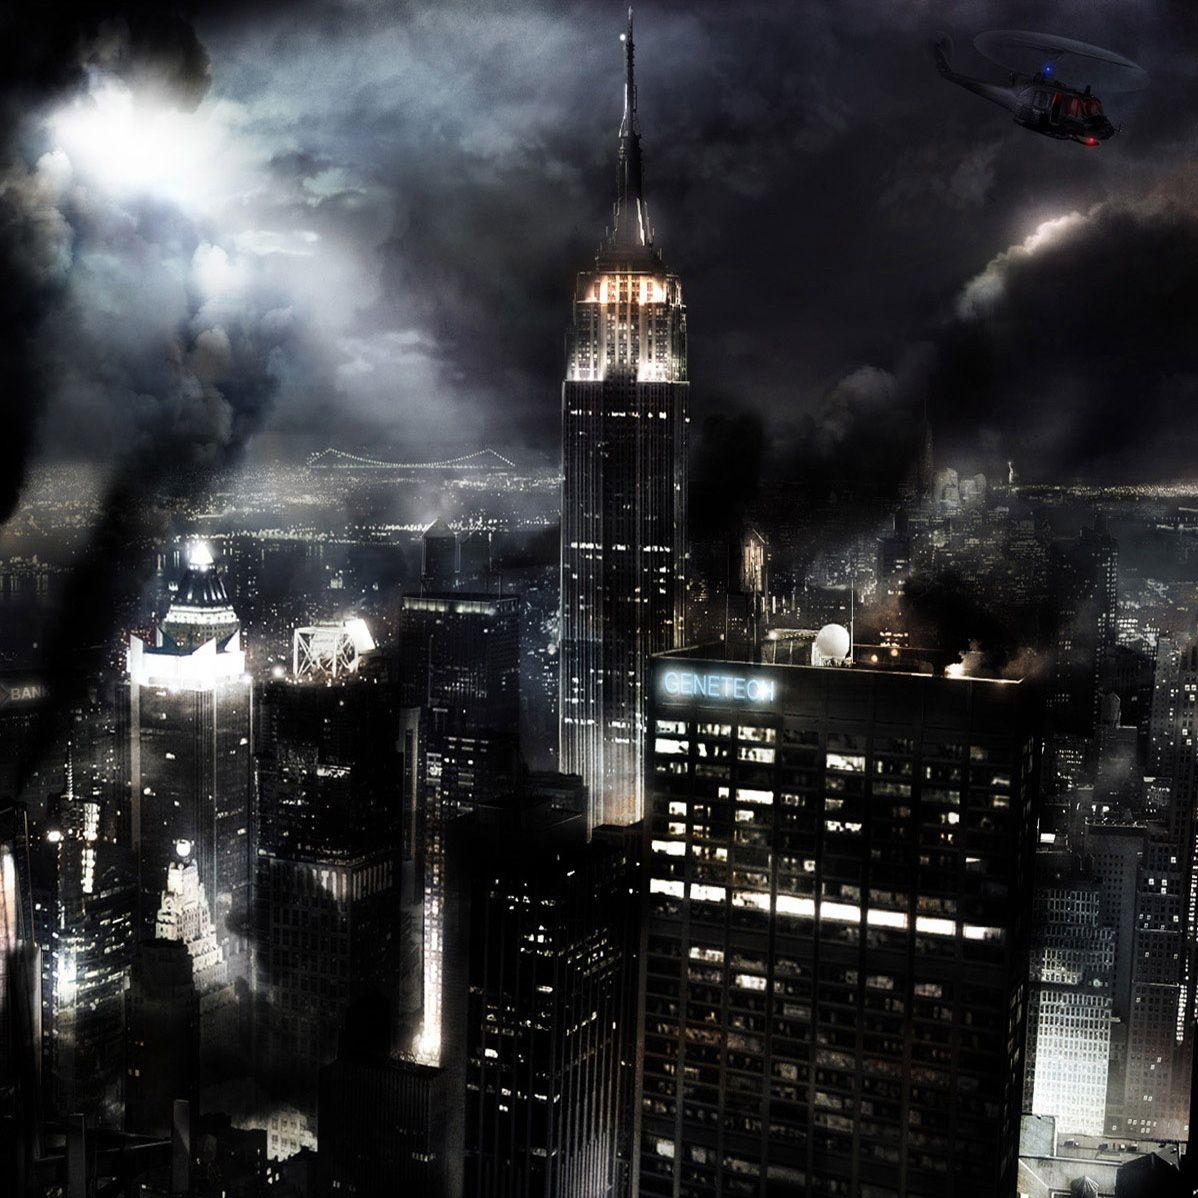 Dark City Backgrounds 1198x1198